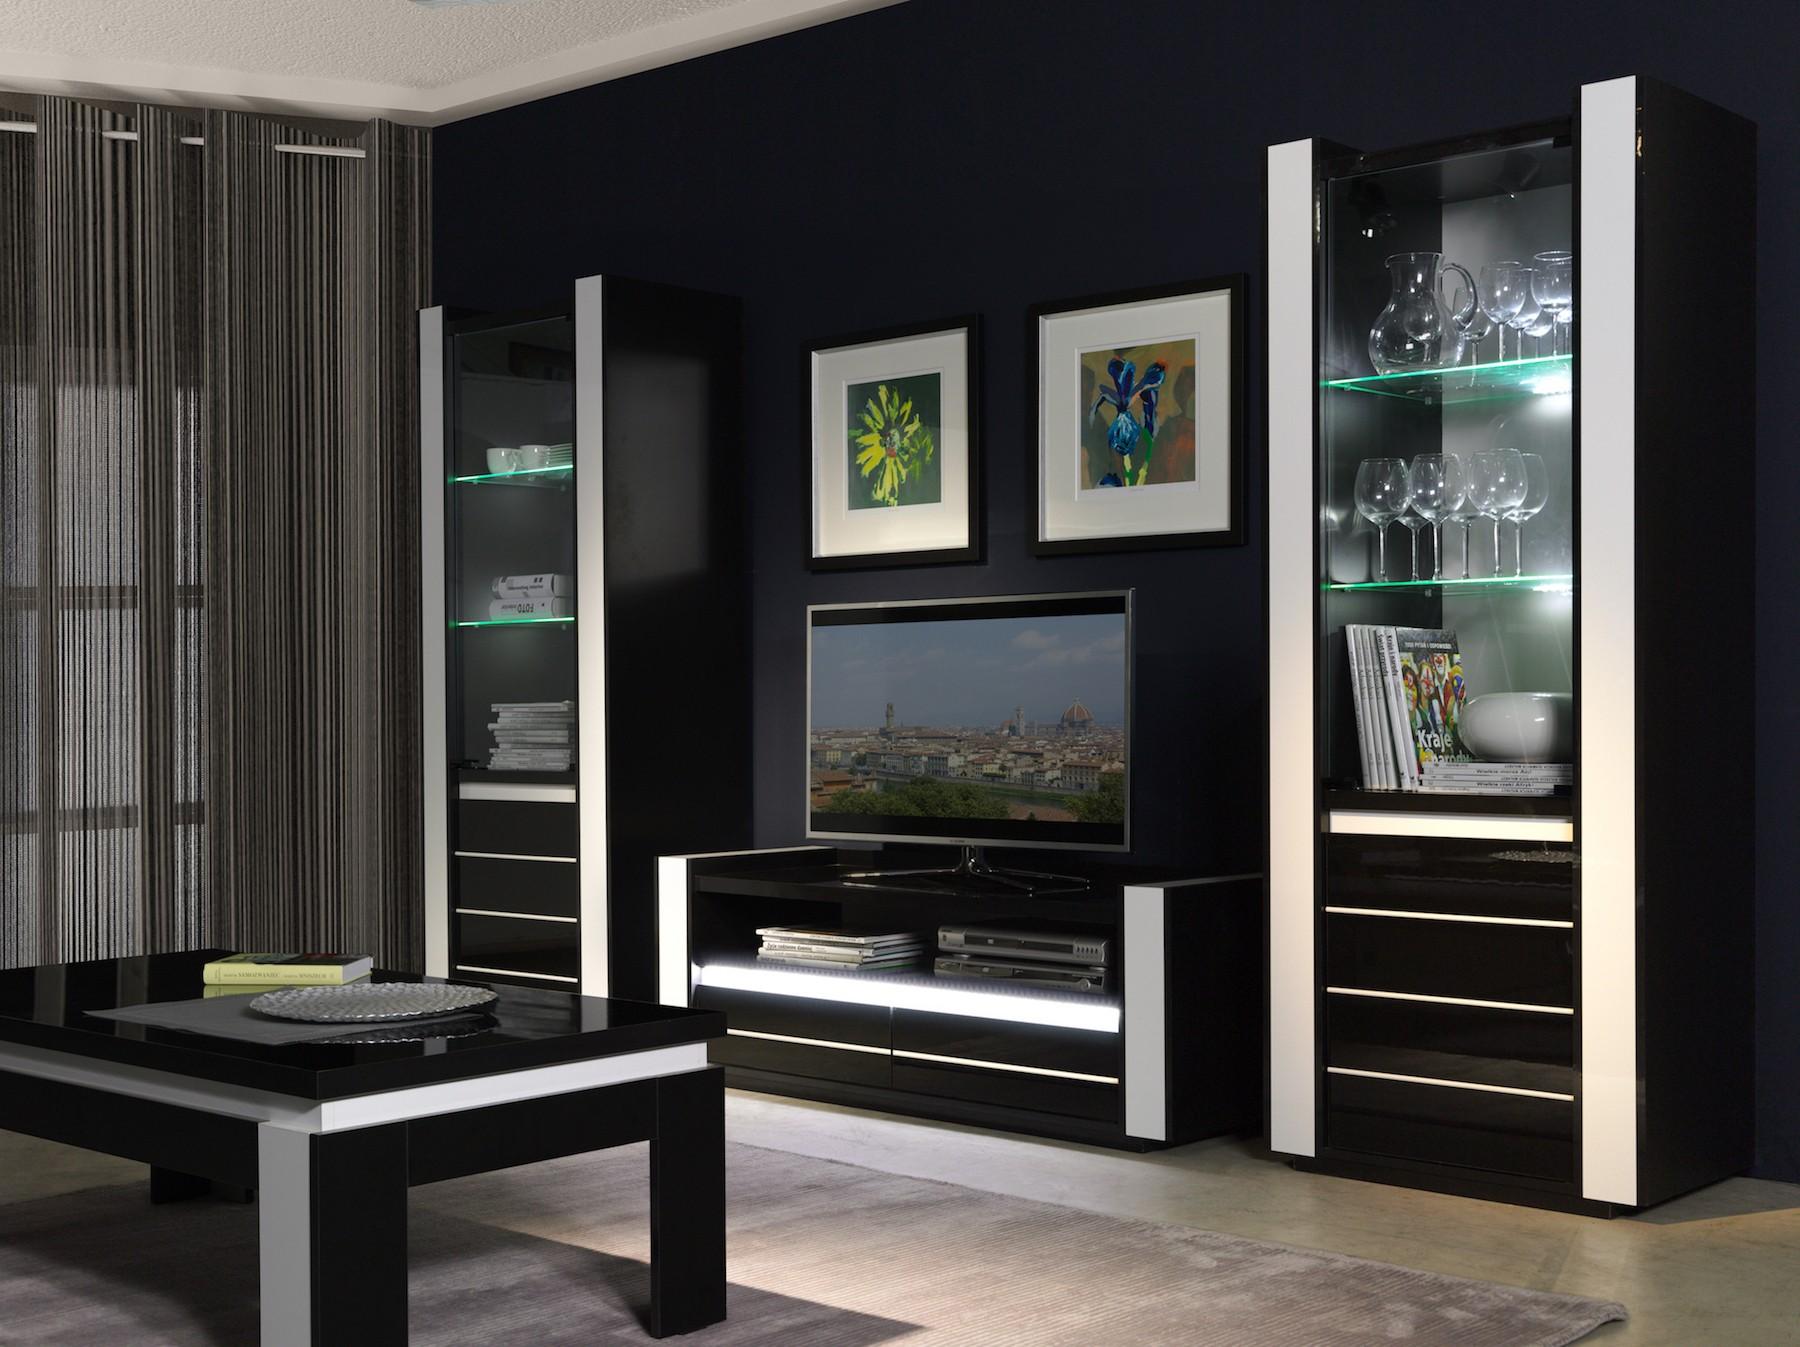 salon meuble tv lina noir et blanc brillant led. Black Bedroom Furniture Sets. Home Design Ideas